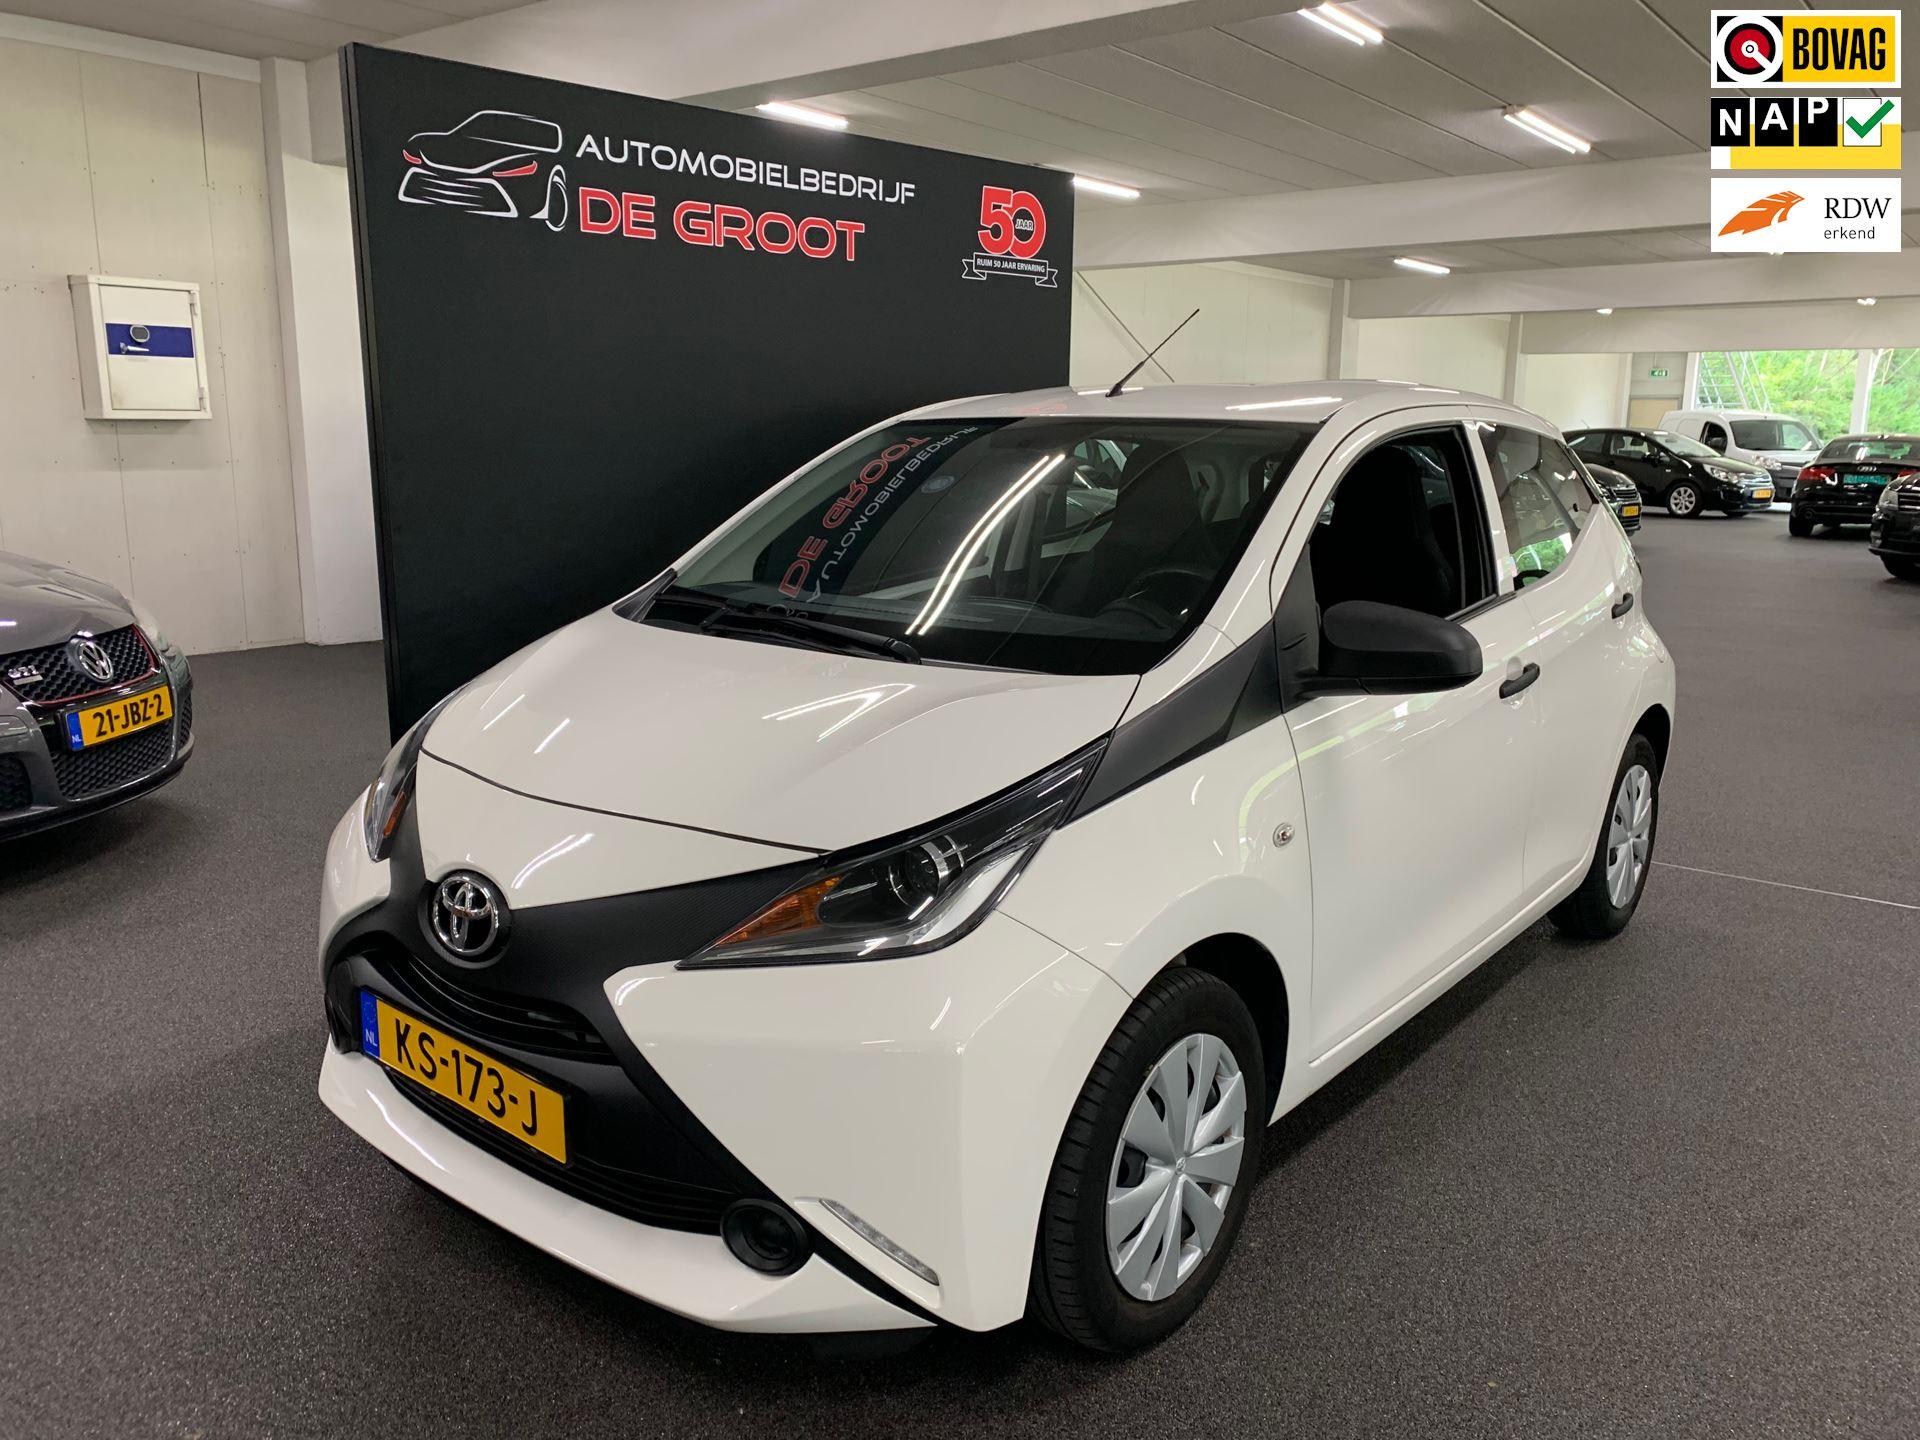 Toyota Aygo occasion - Automobielbedrijf de Groot